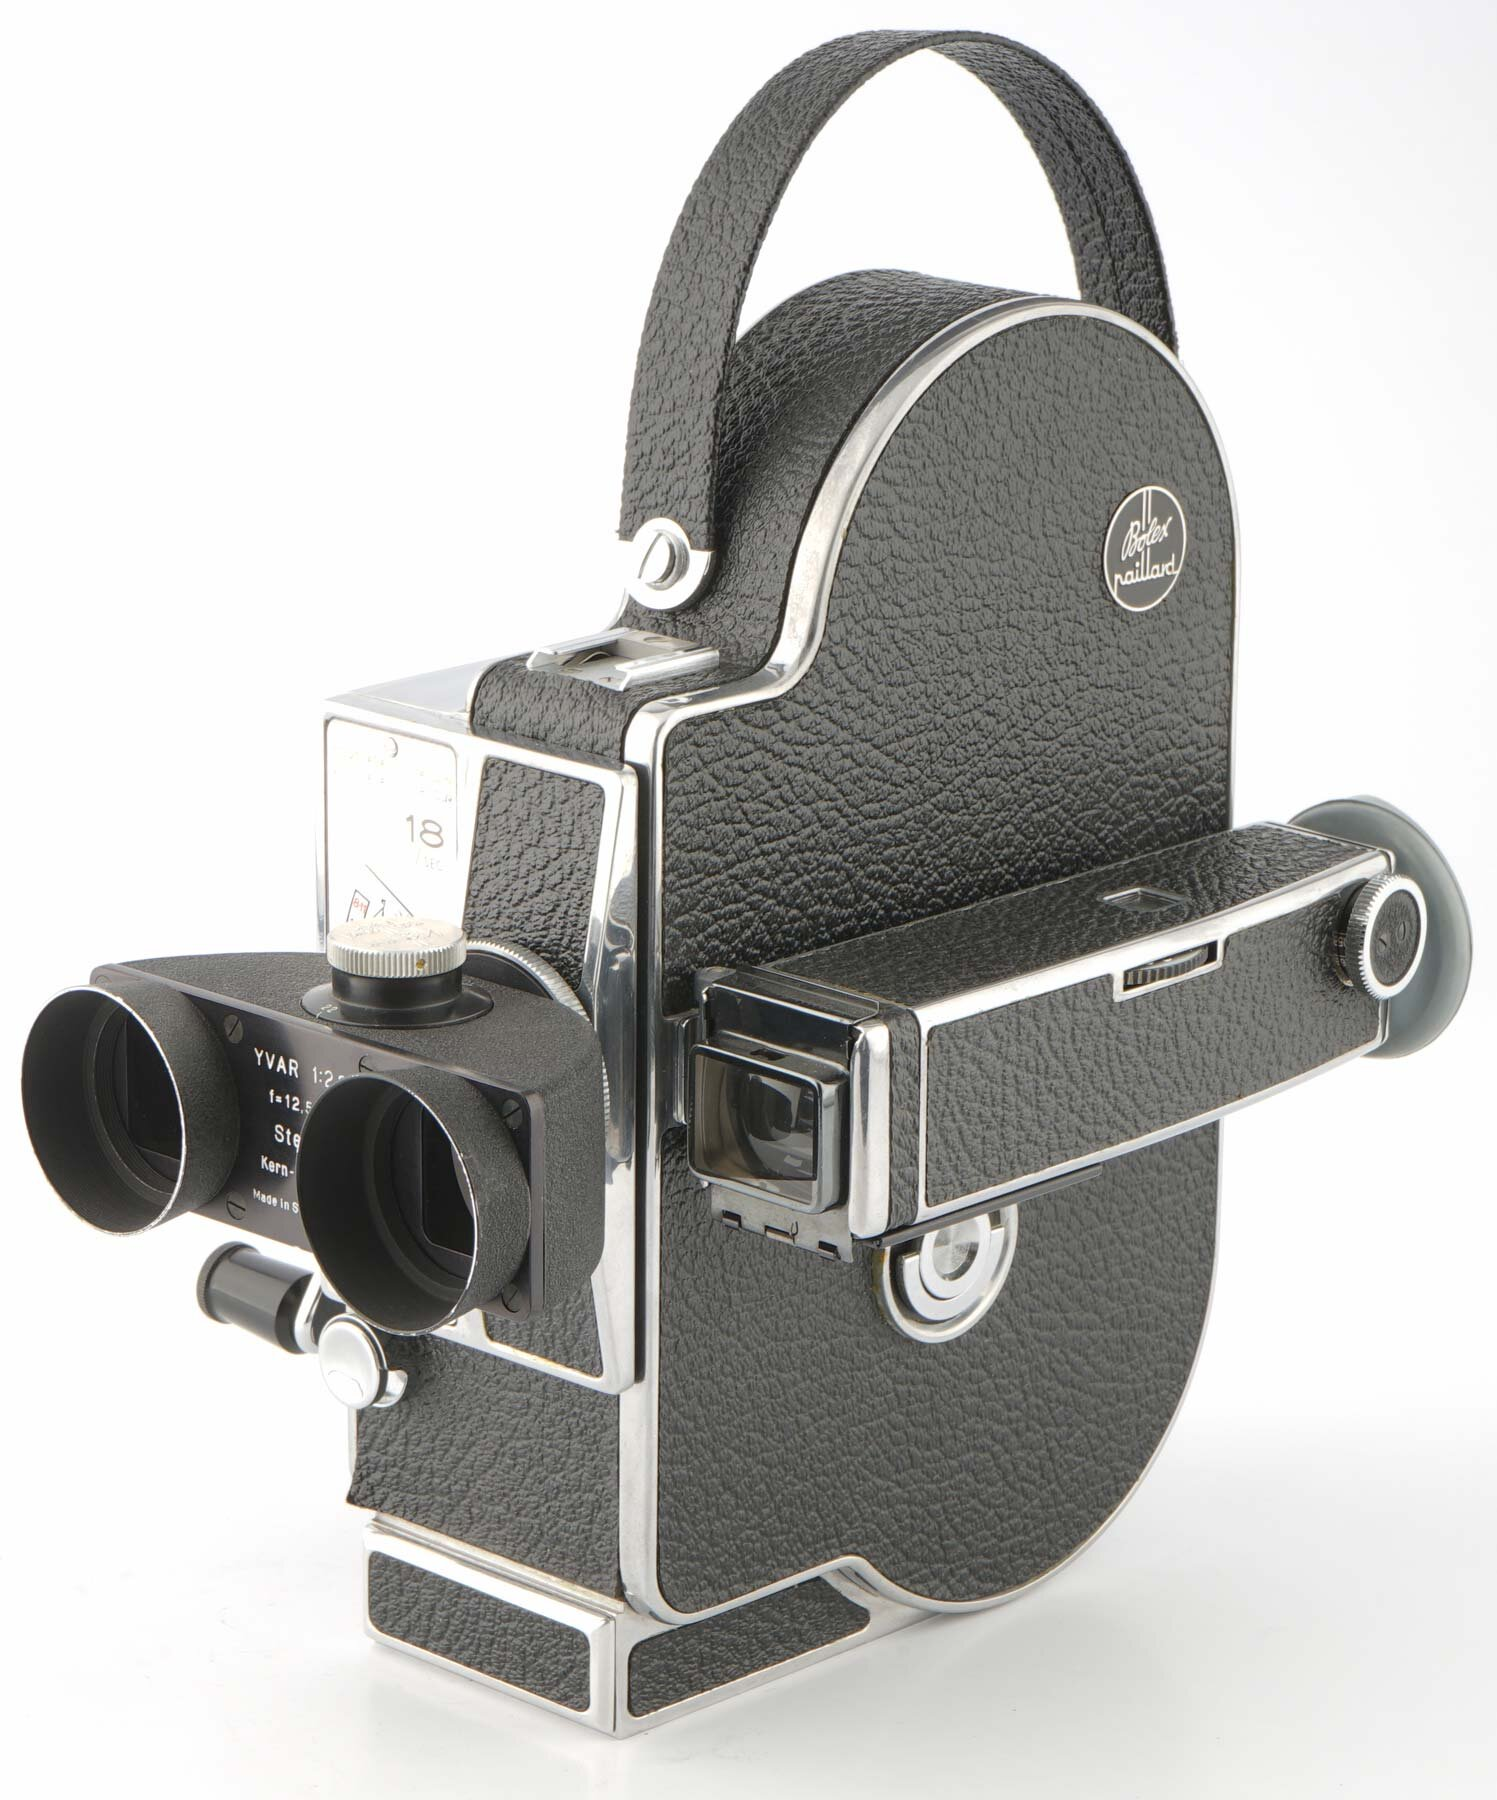 Bolex H16M mit Kern YVAR 2.8/12.5mm Stereo